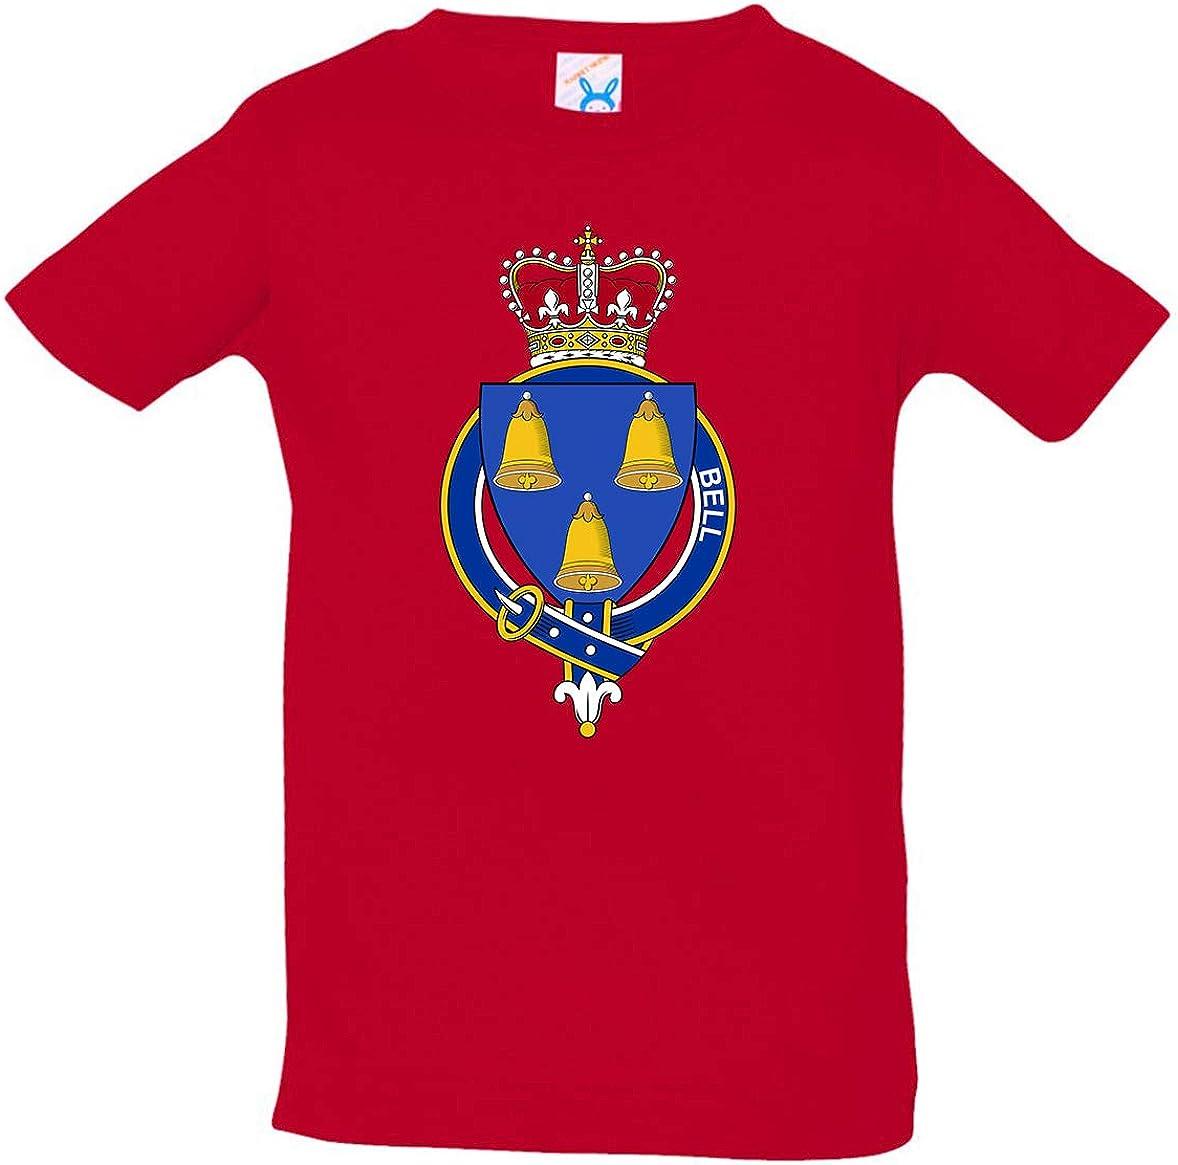 Tenacitee Babys Scottish Garter Family Bell Shirt